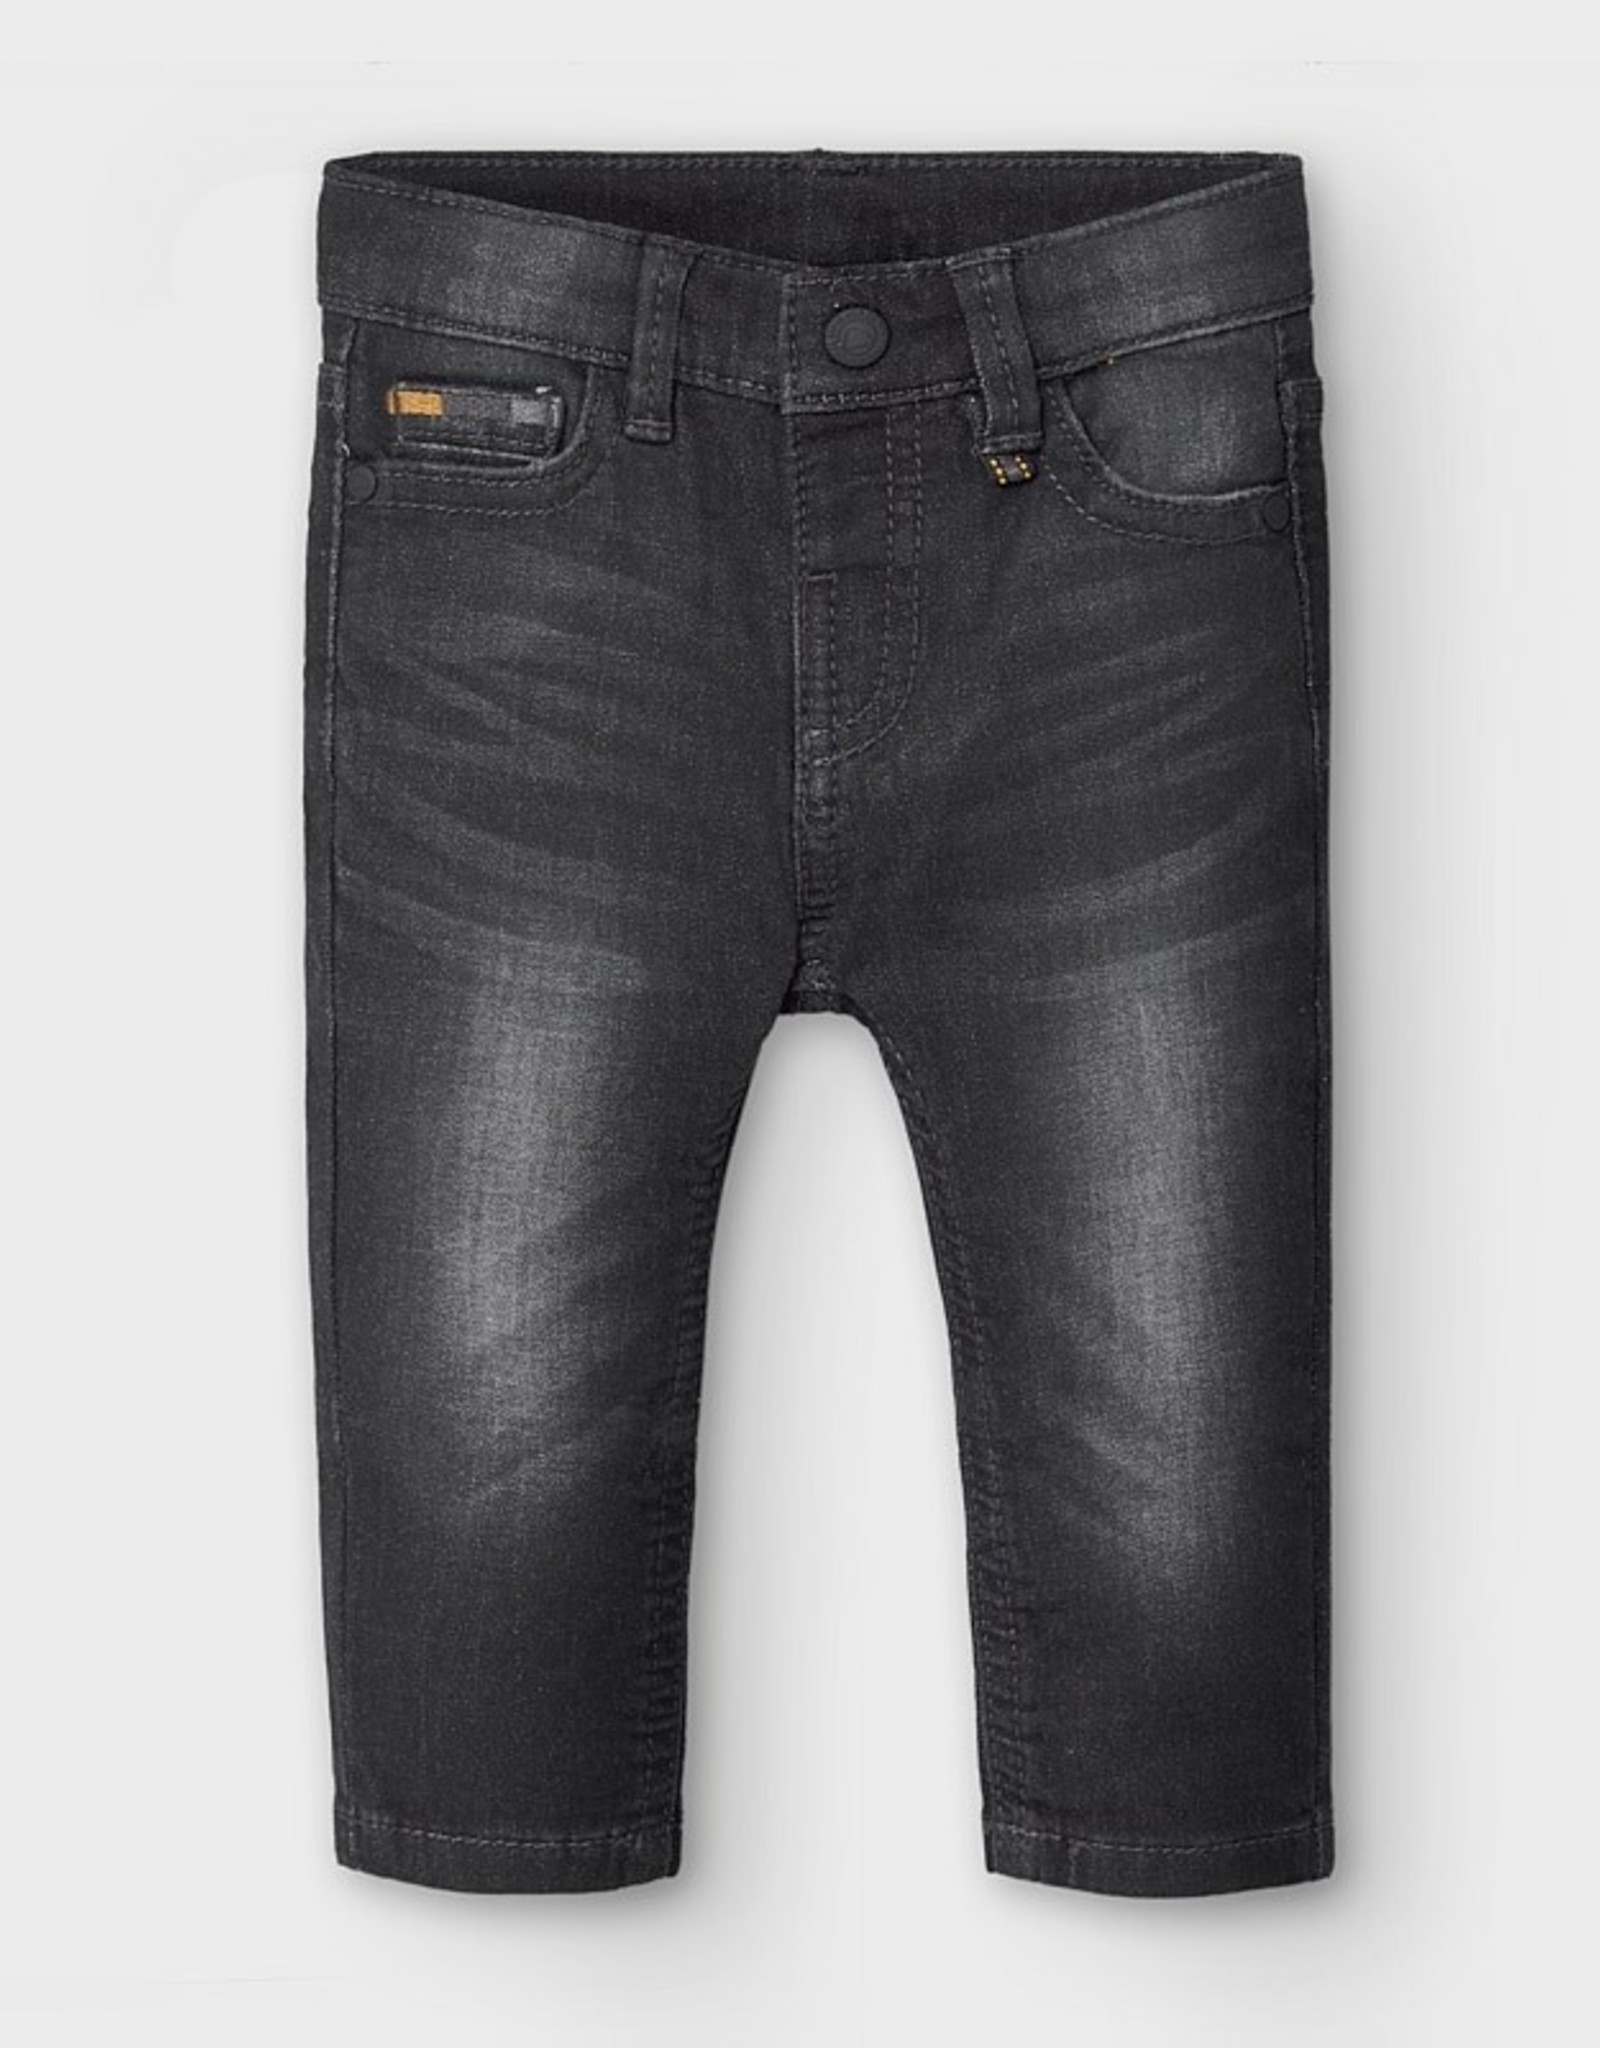 Mayoral FA20 Black Soft Jeans